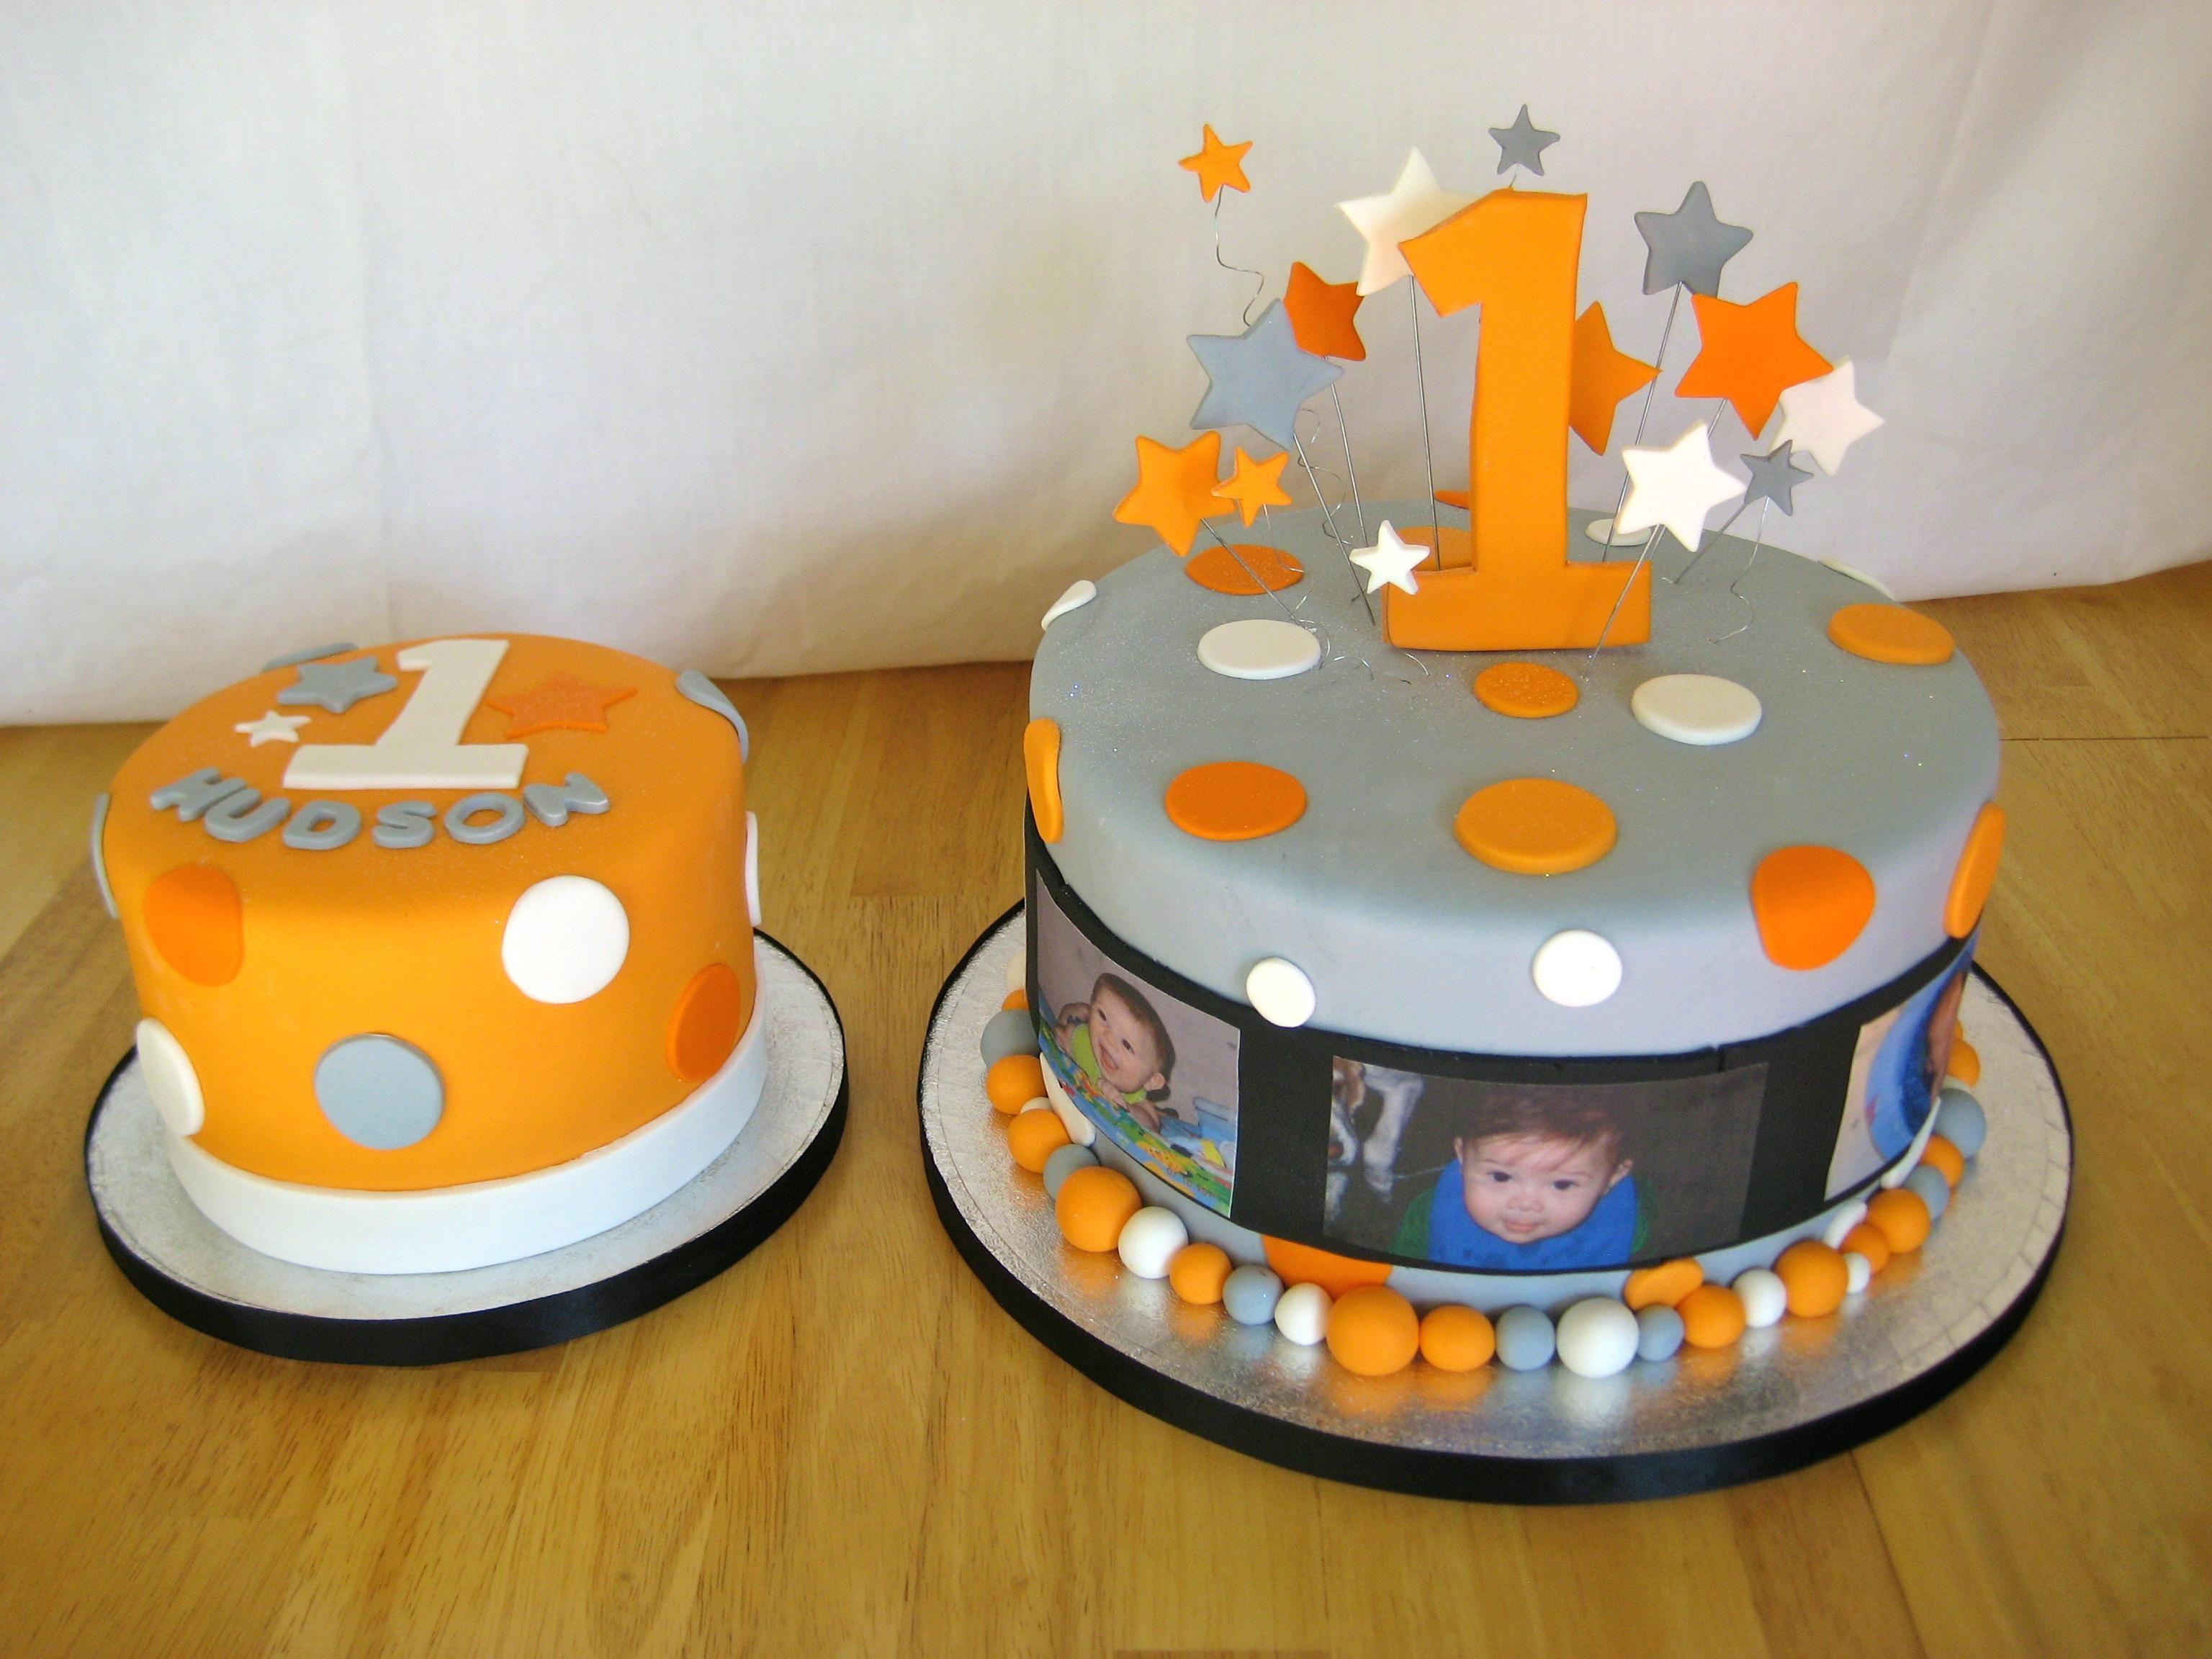 Strange 1 Year Old Boy Cake Design Google Search 1 Year Old Birthday Funny Birthday Cards Online Inifodamsfinfo